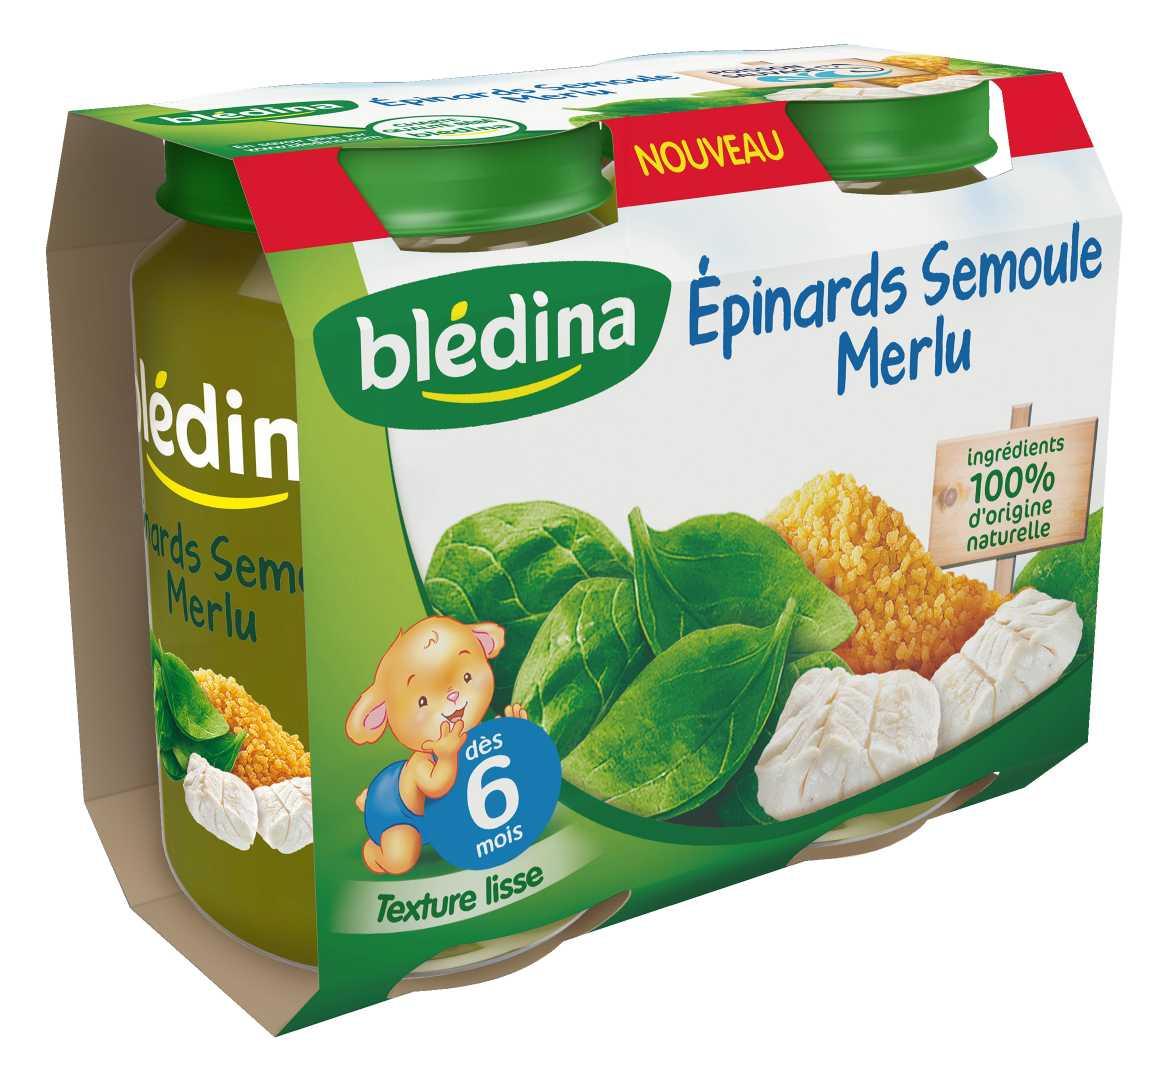 Pot Épinards Semoule Merlu 2x200g BLEDINA